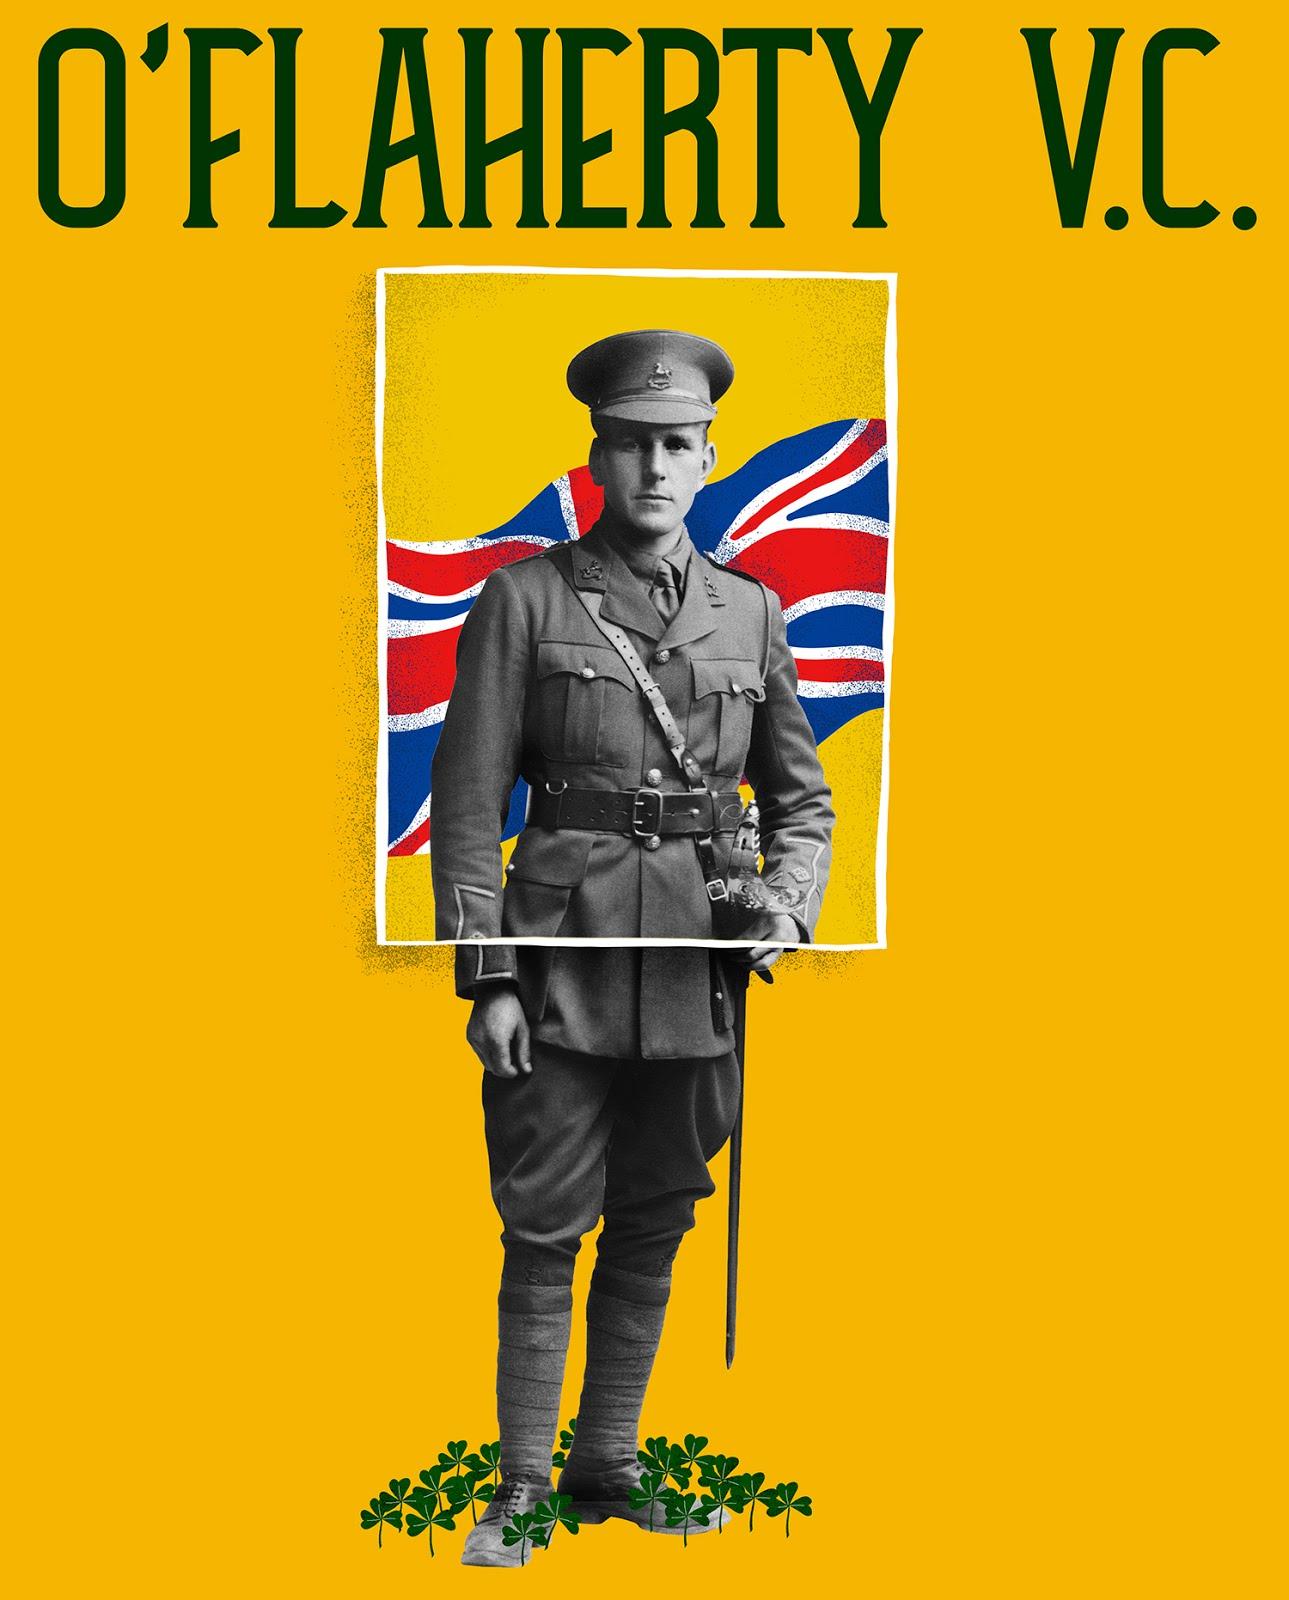 Shaw 2018 - O'Flaherty V. C.